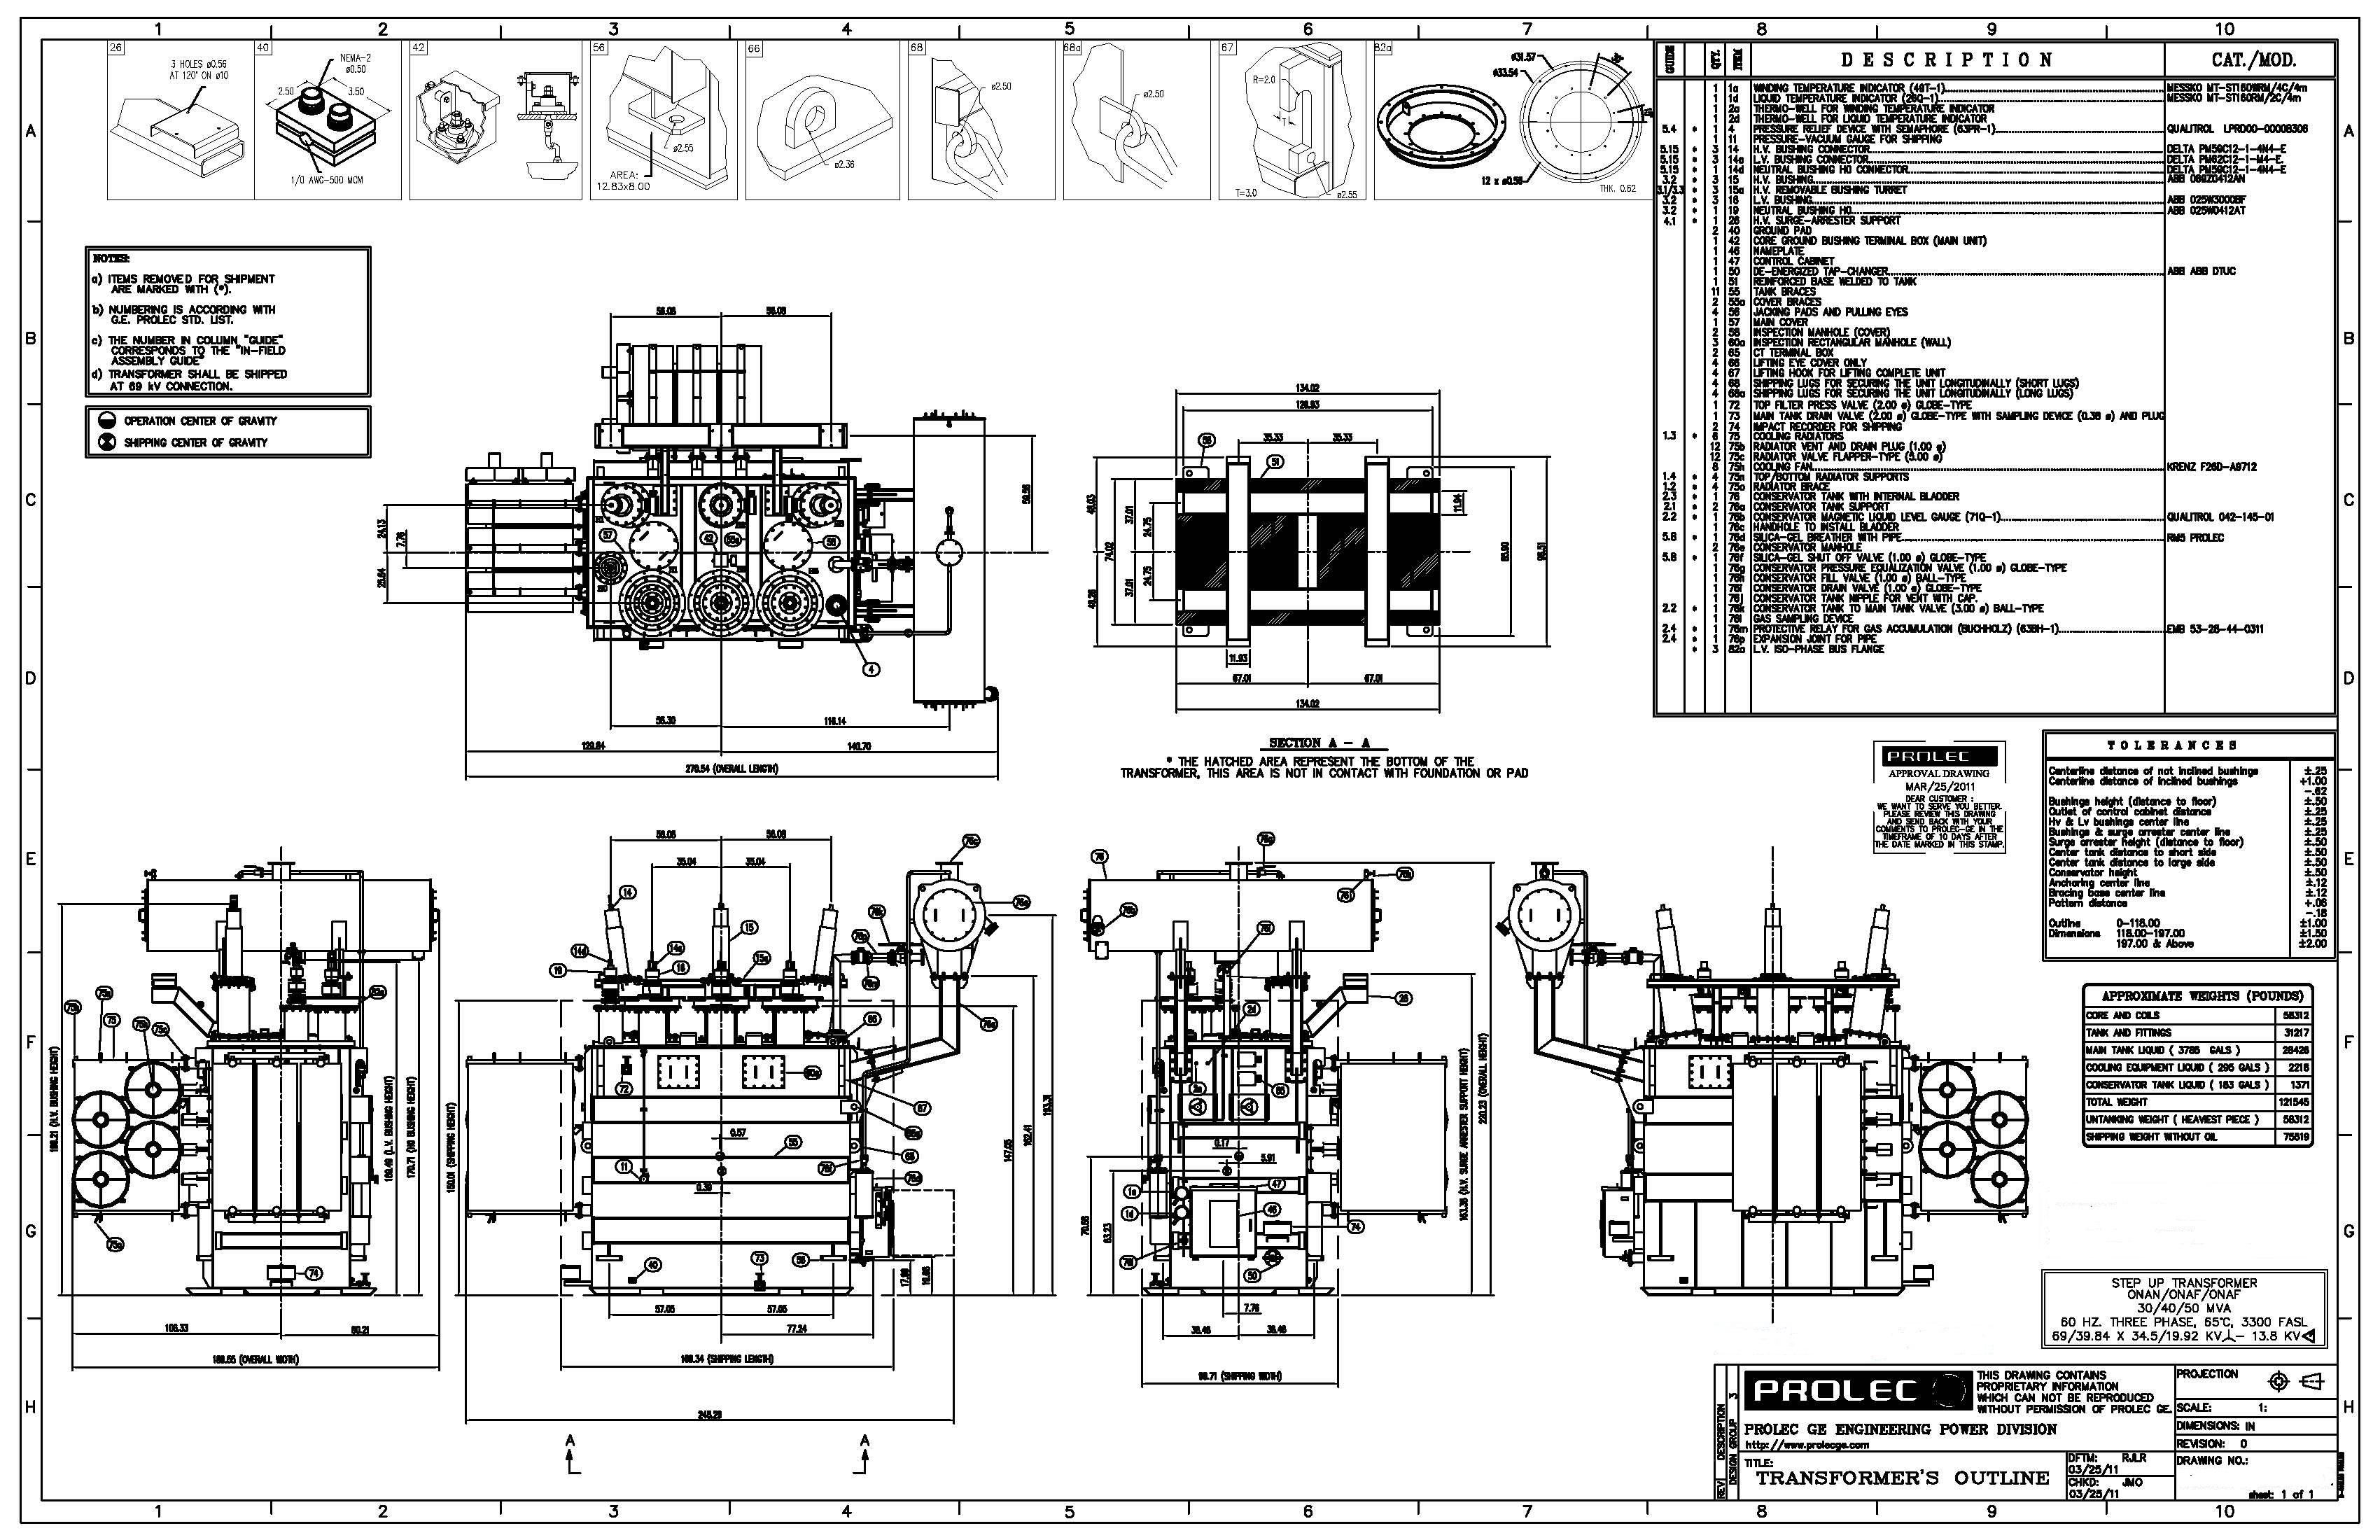 GE Prolec, Generator Step Up Transformer 30/40/50 MVA, 69